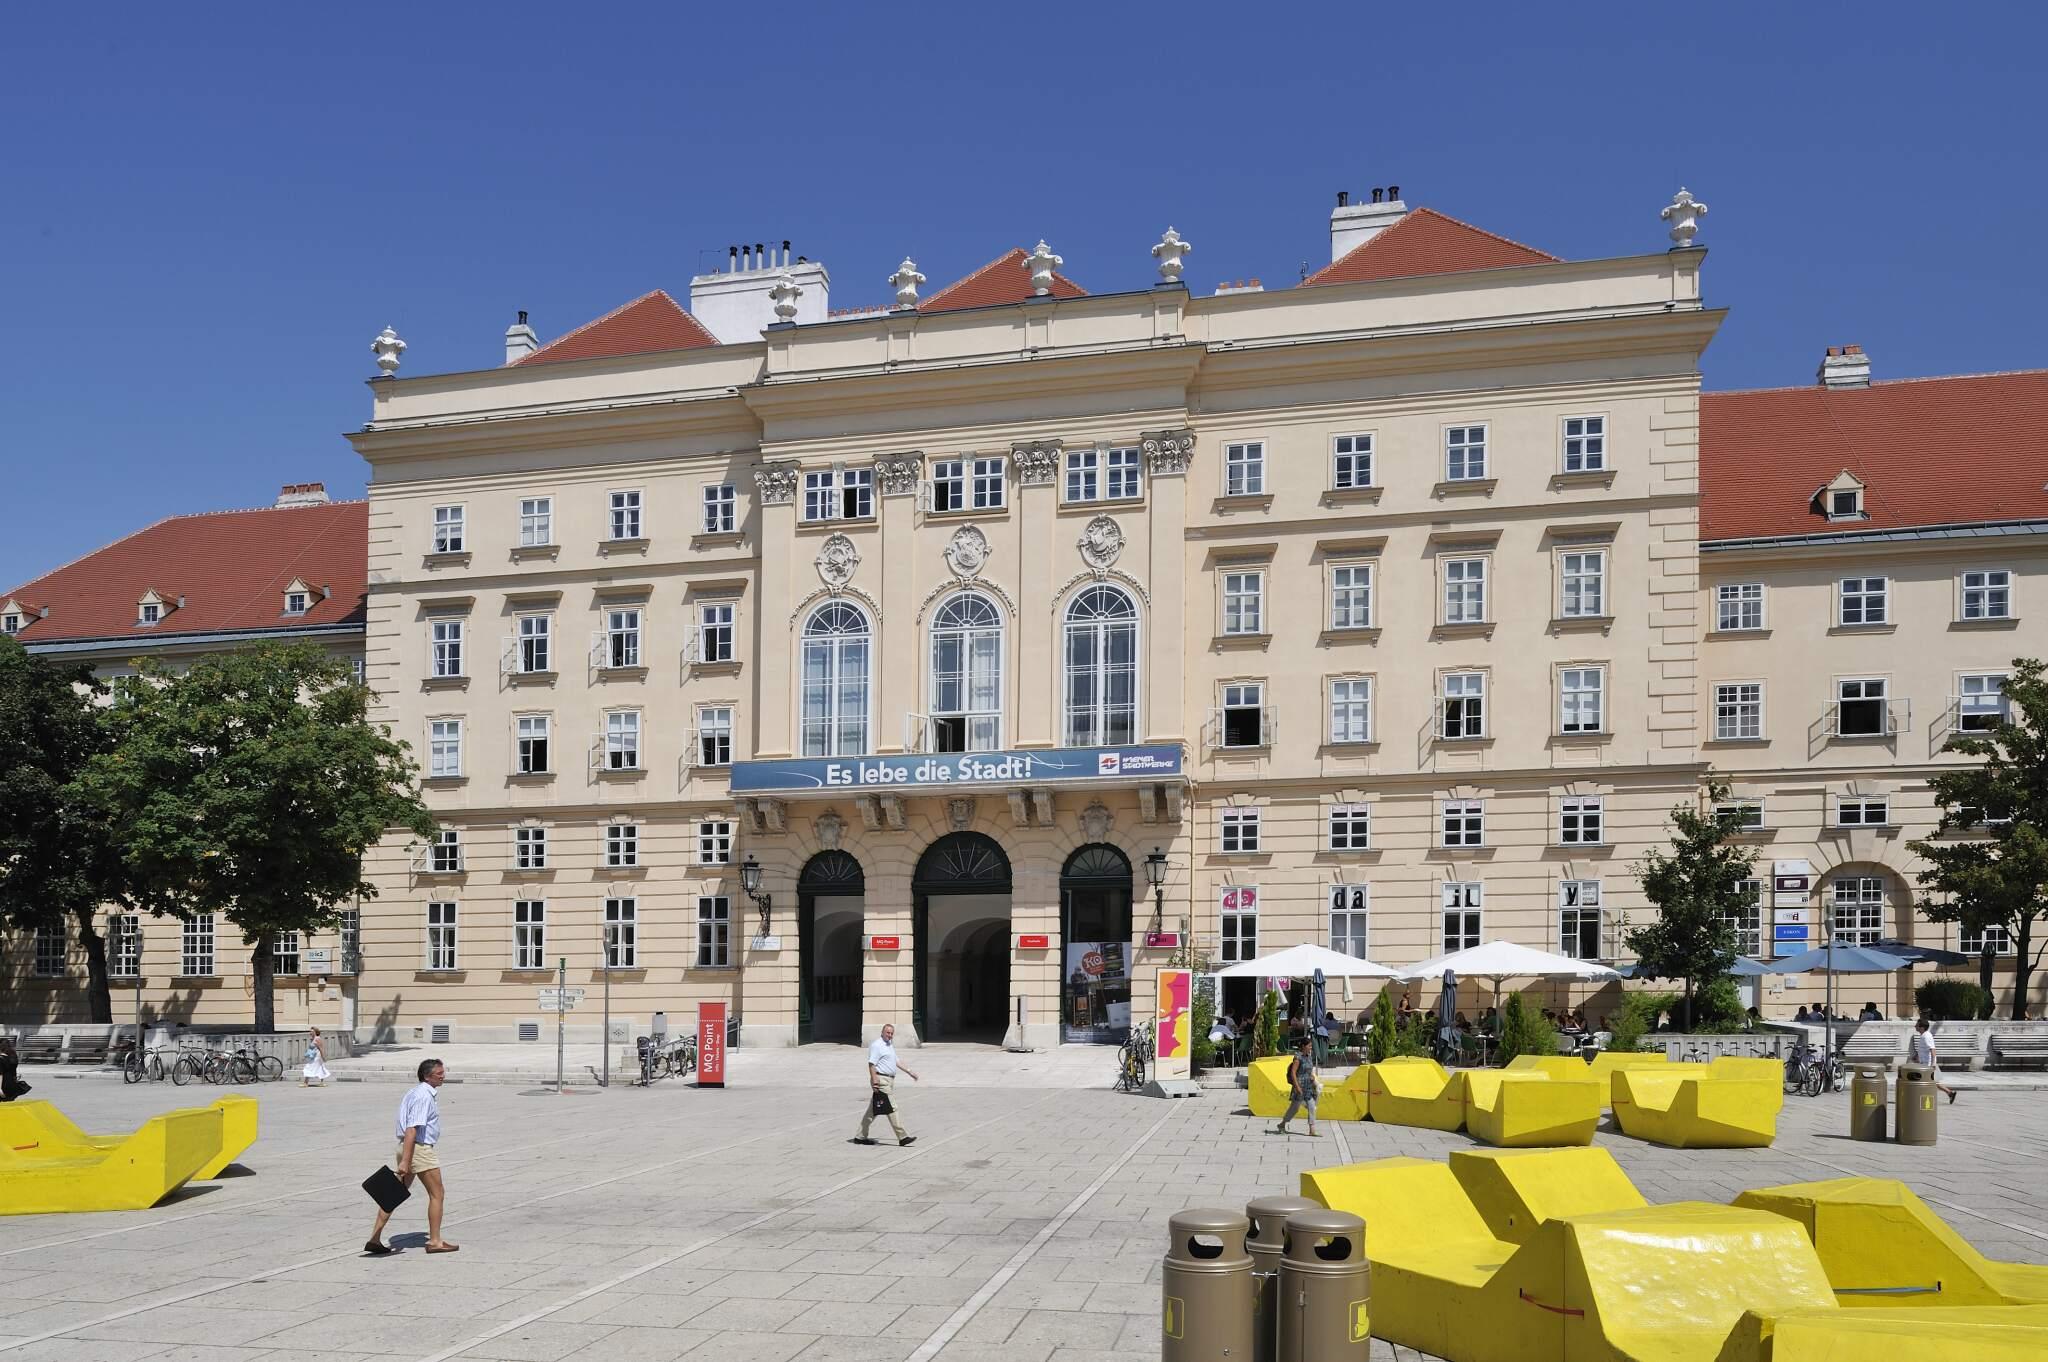 Museumsquartier Innenhof mit Enzis